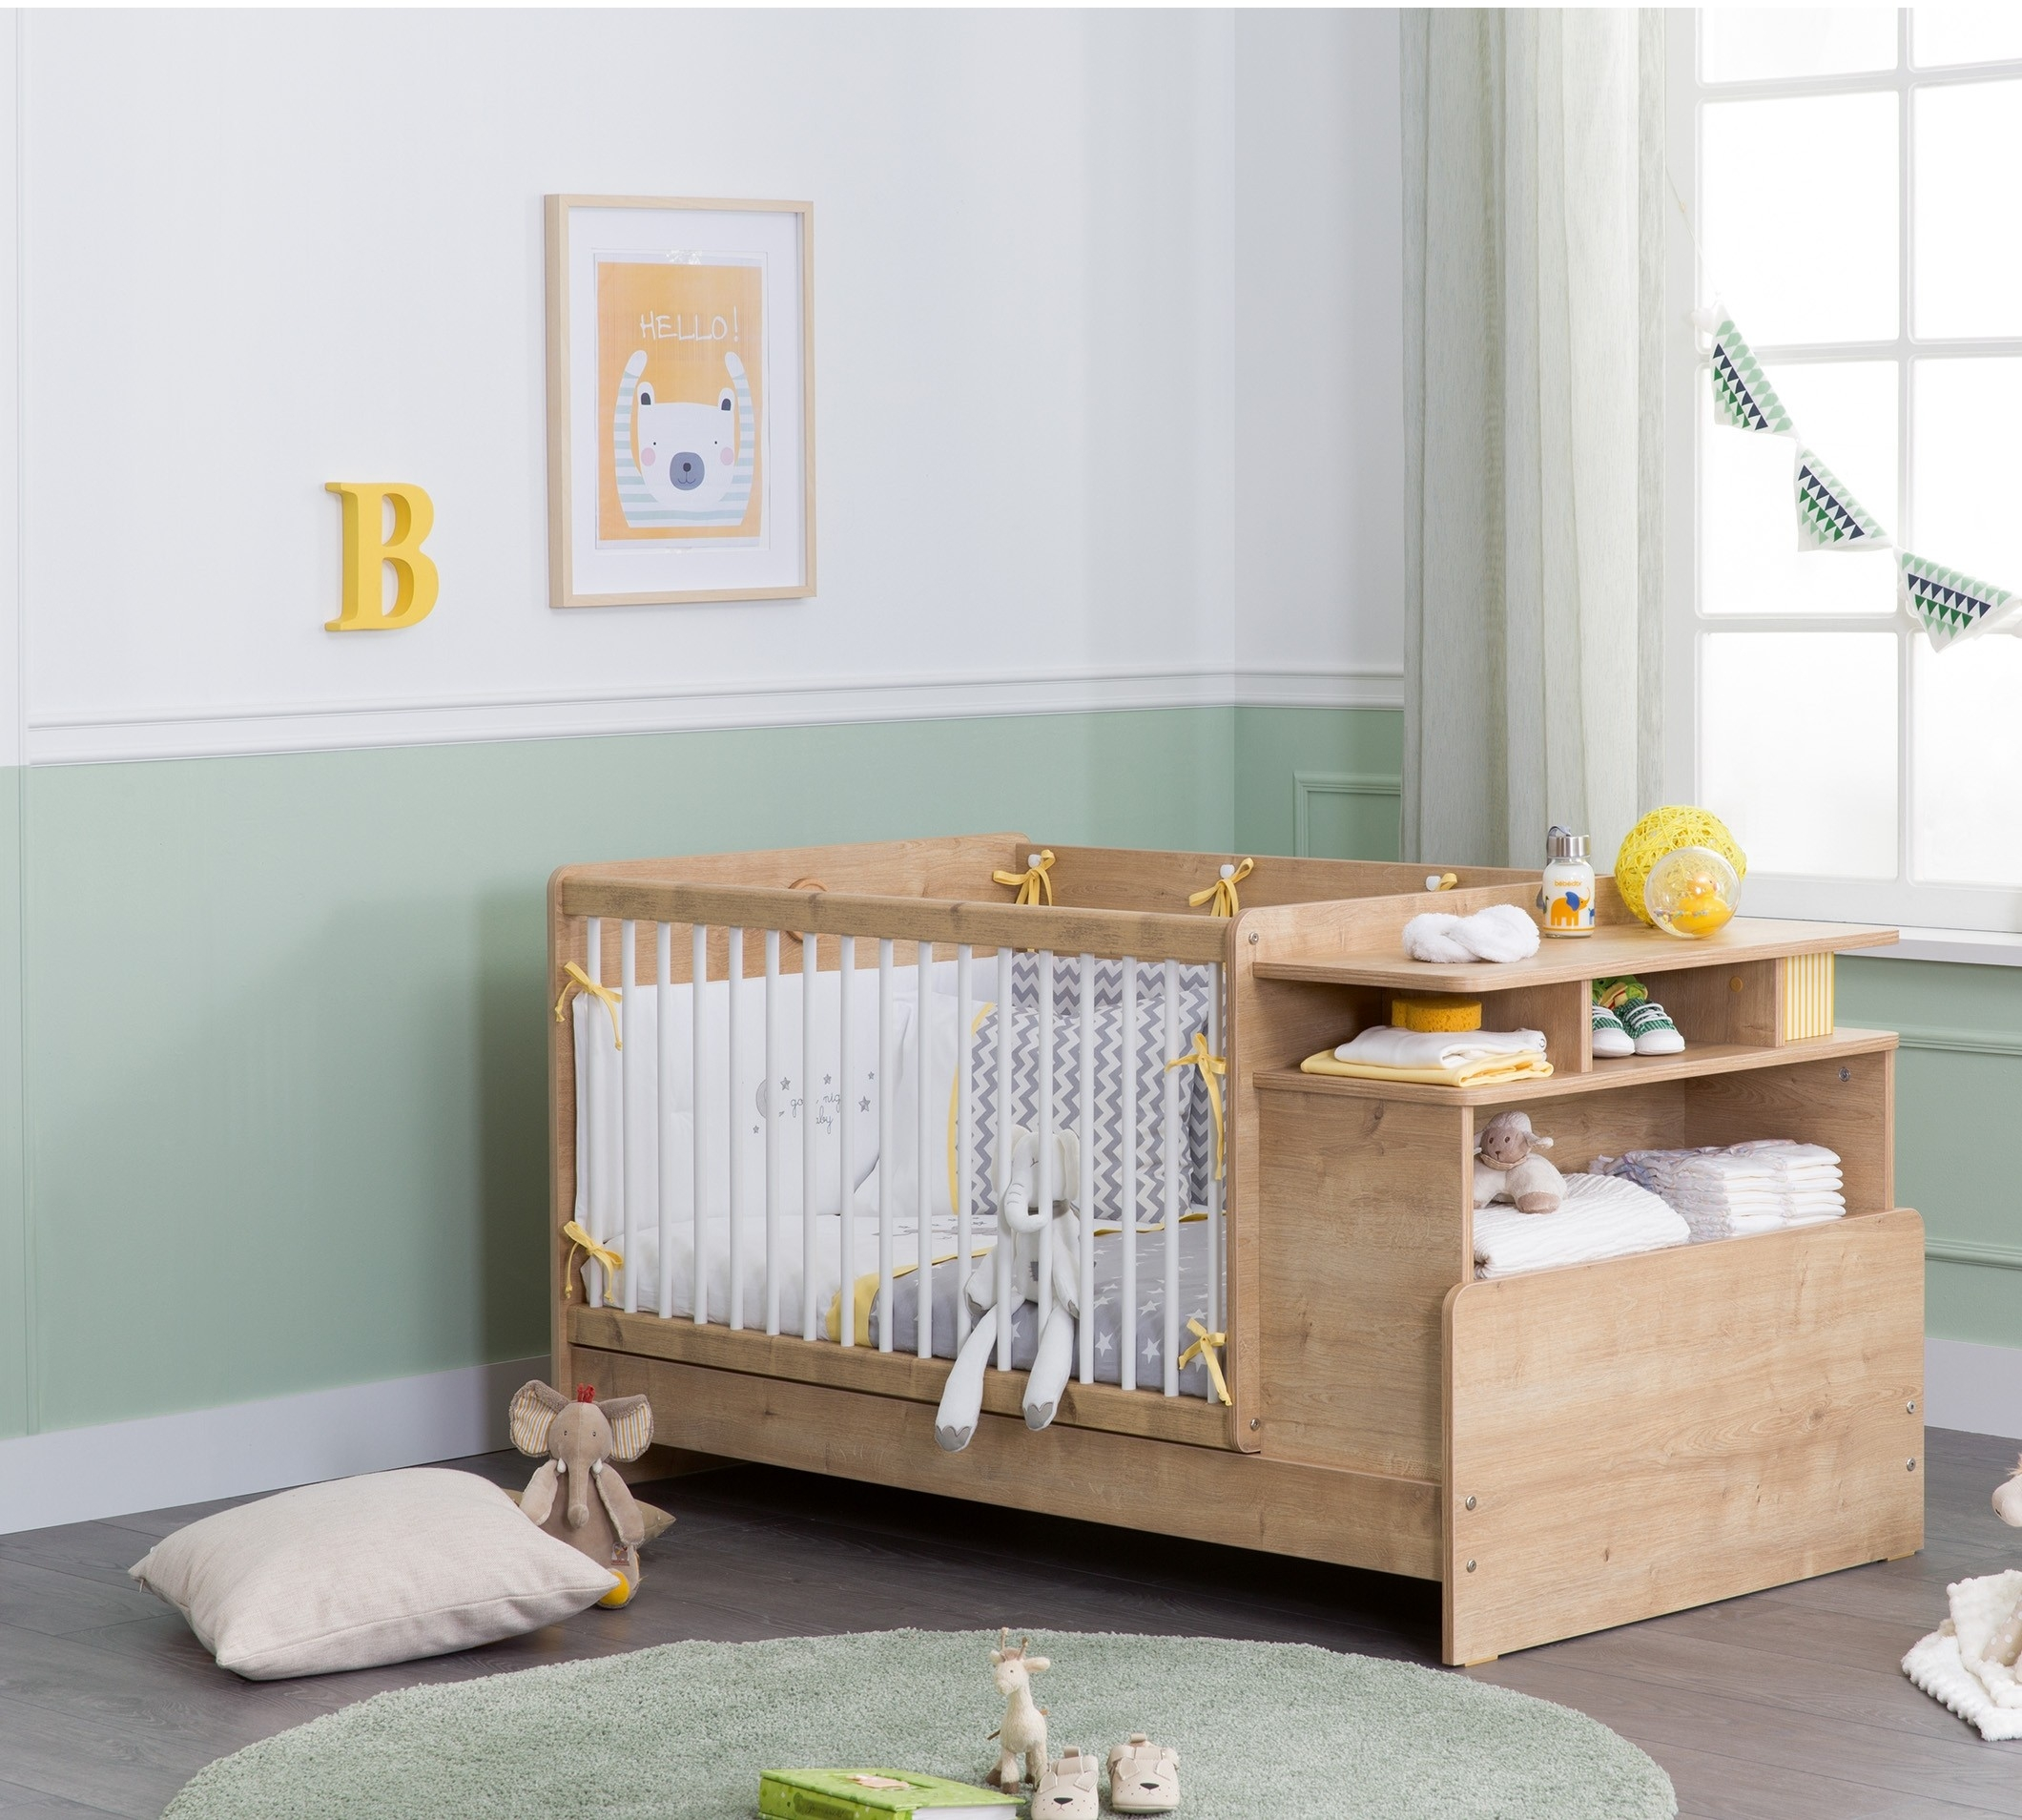 Patut transformabil din pal, pentru bebe Masali Baby Stejar, 110 x 70 cm imagine